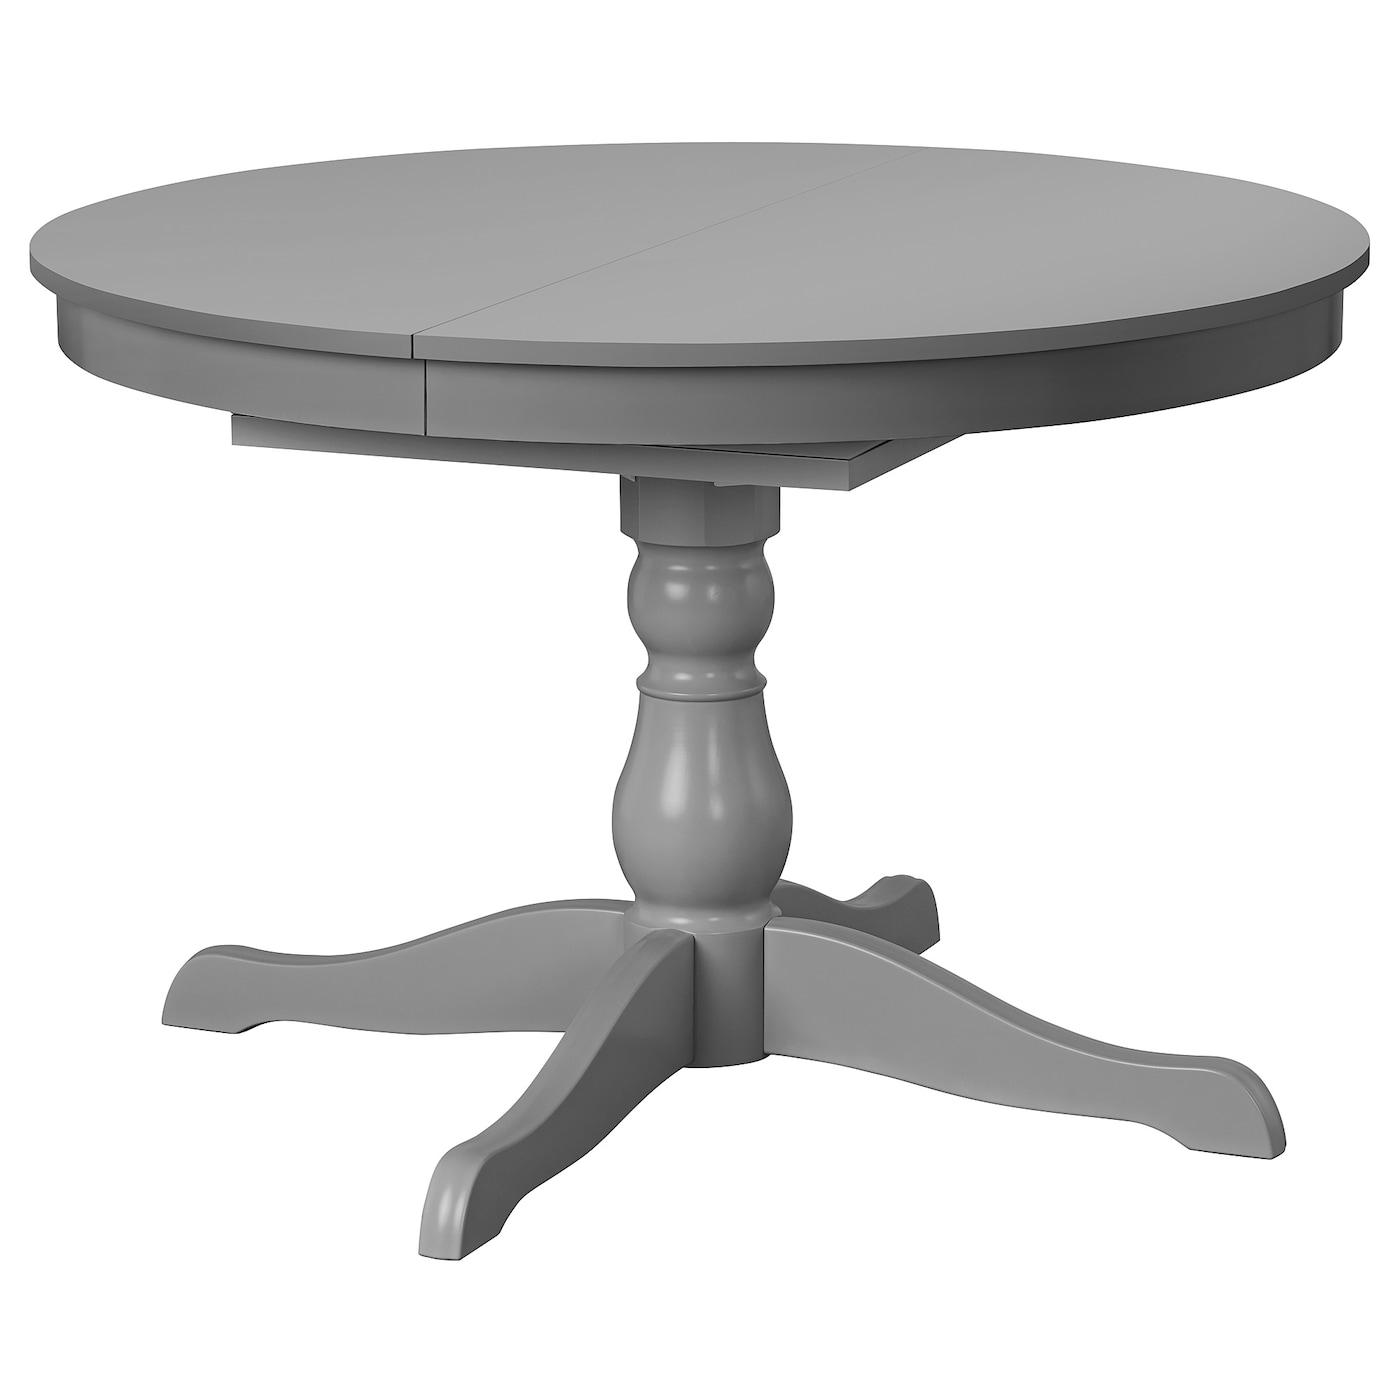 INGATORP Extendable table - gray - IKEA